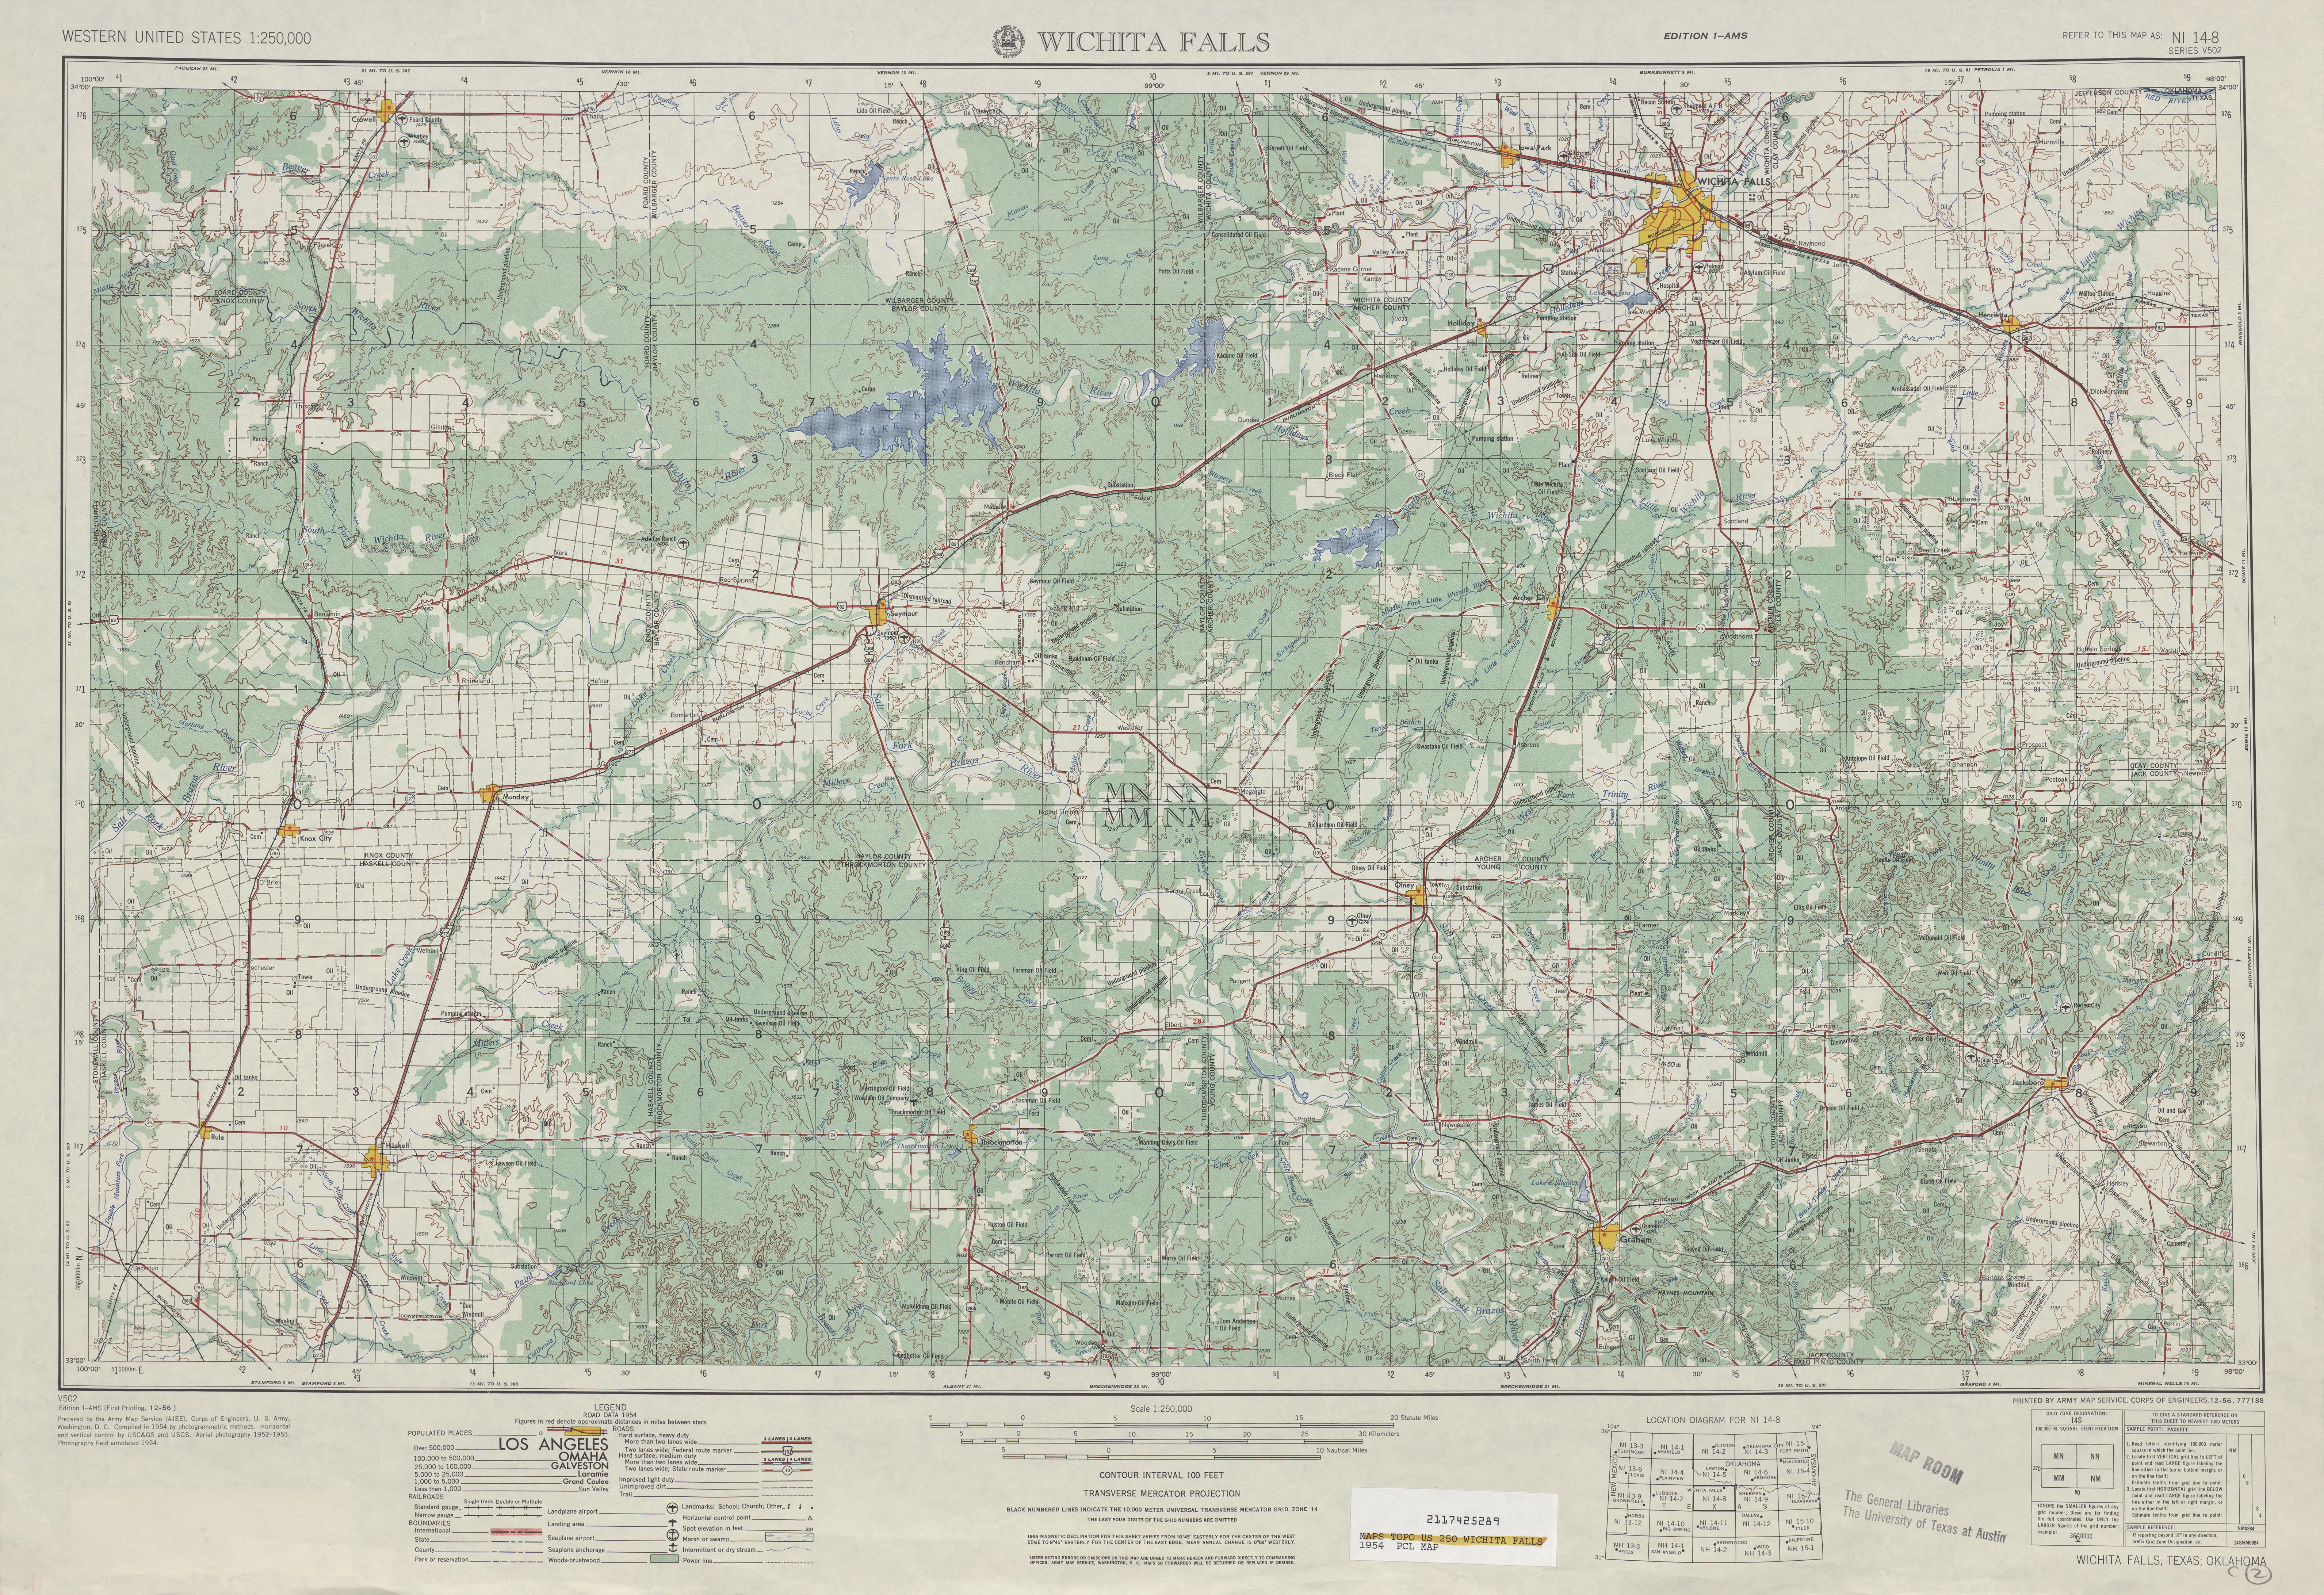 Wichita Falls Topographic Map Sheet, United States 1954